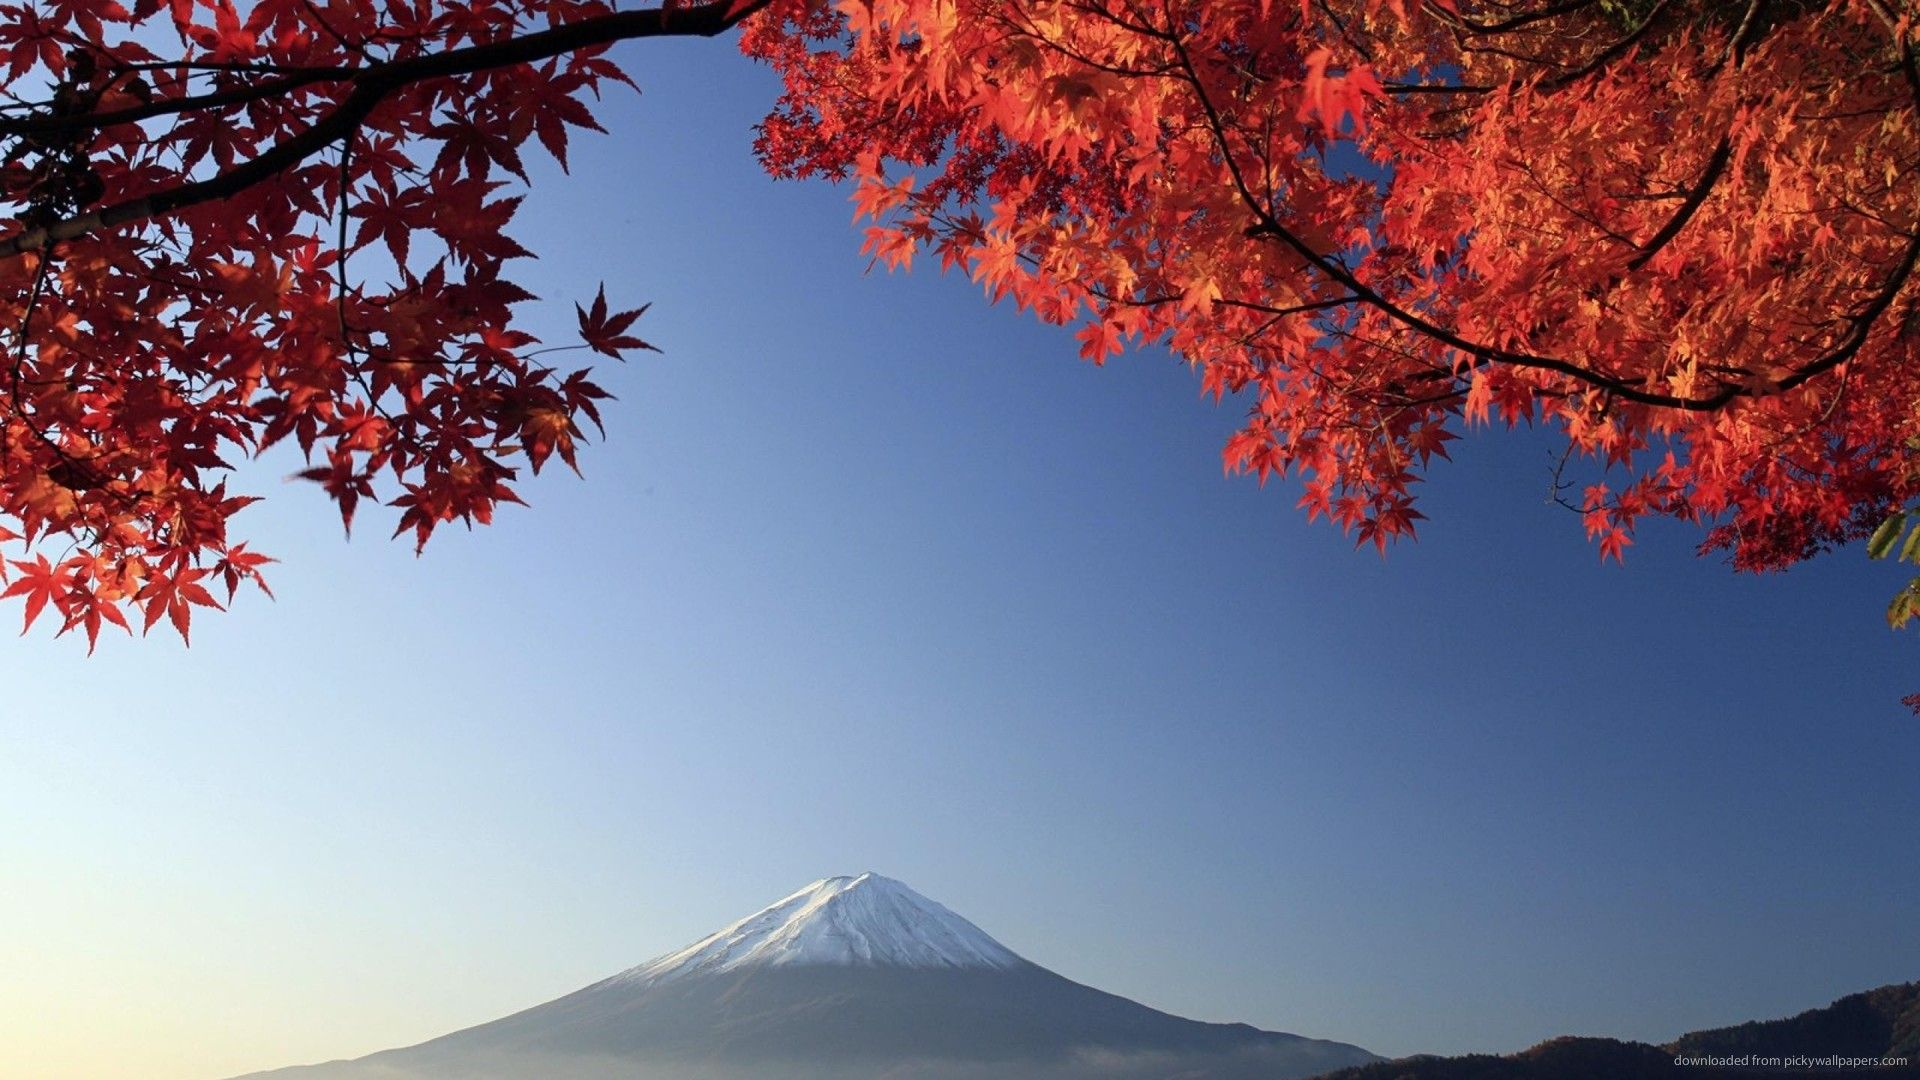 Japan Wallpaper 18 Jpg 1920 1080 Carta Da Parati Natura Tema Wordpress Wordpress